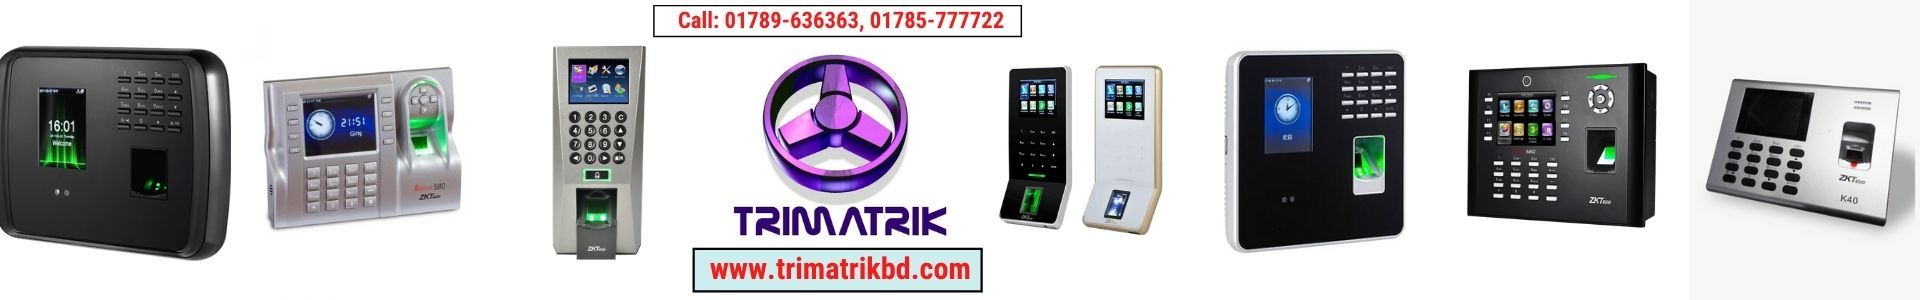 Fingerprint Attendance Machine in Bangladesh, TRIMATRIK BD, Uttara, Dhaka, Bangladesh